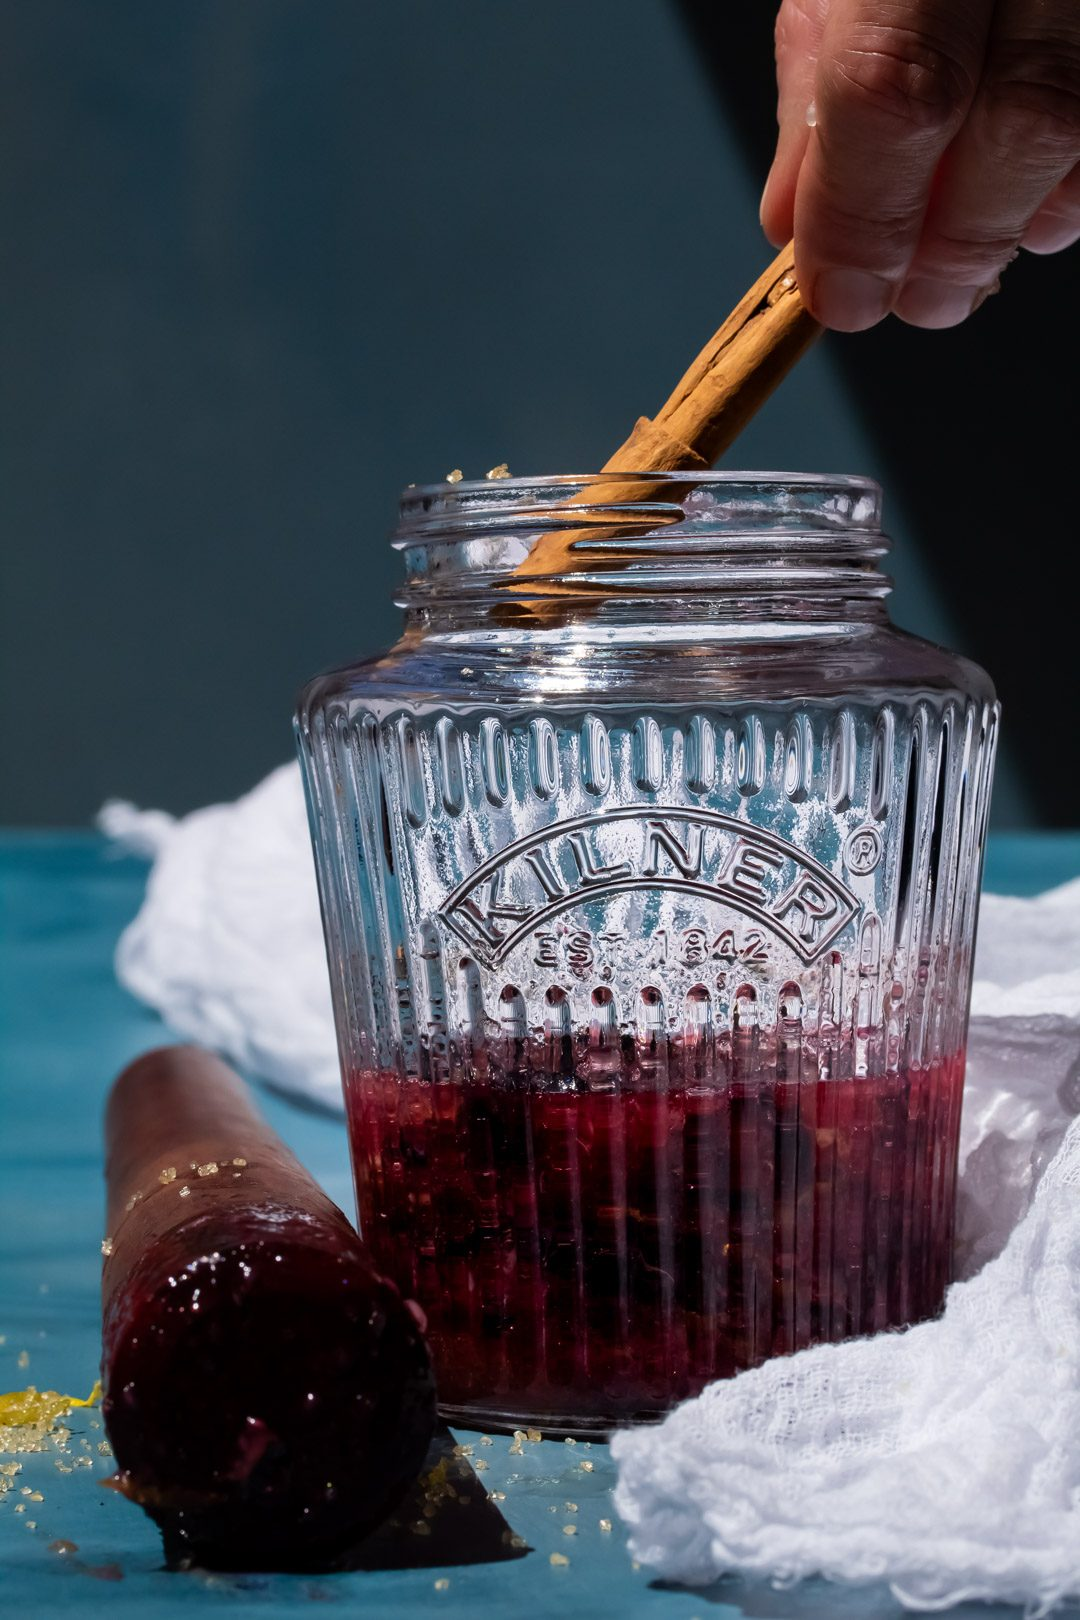 making blueberry shrub syrup, adding a cinnamon stick